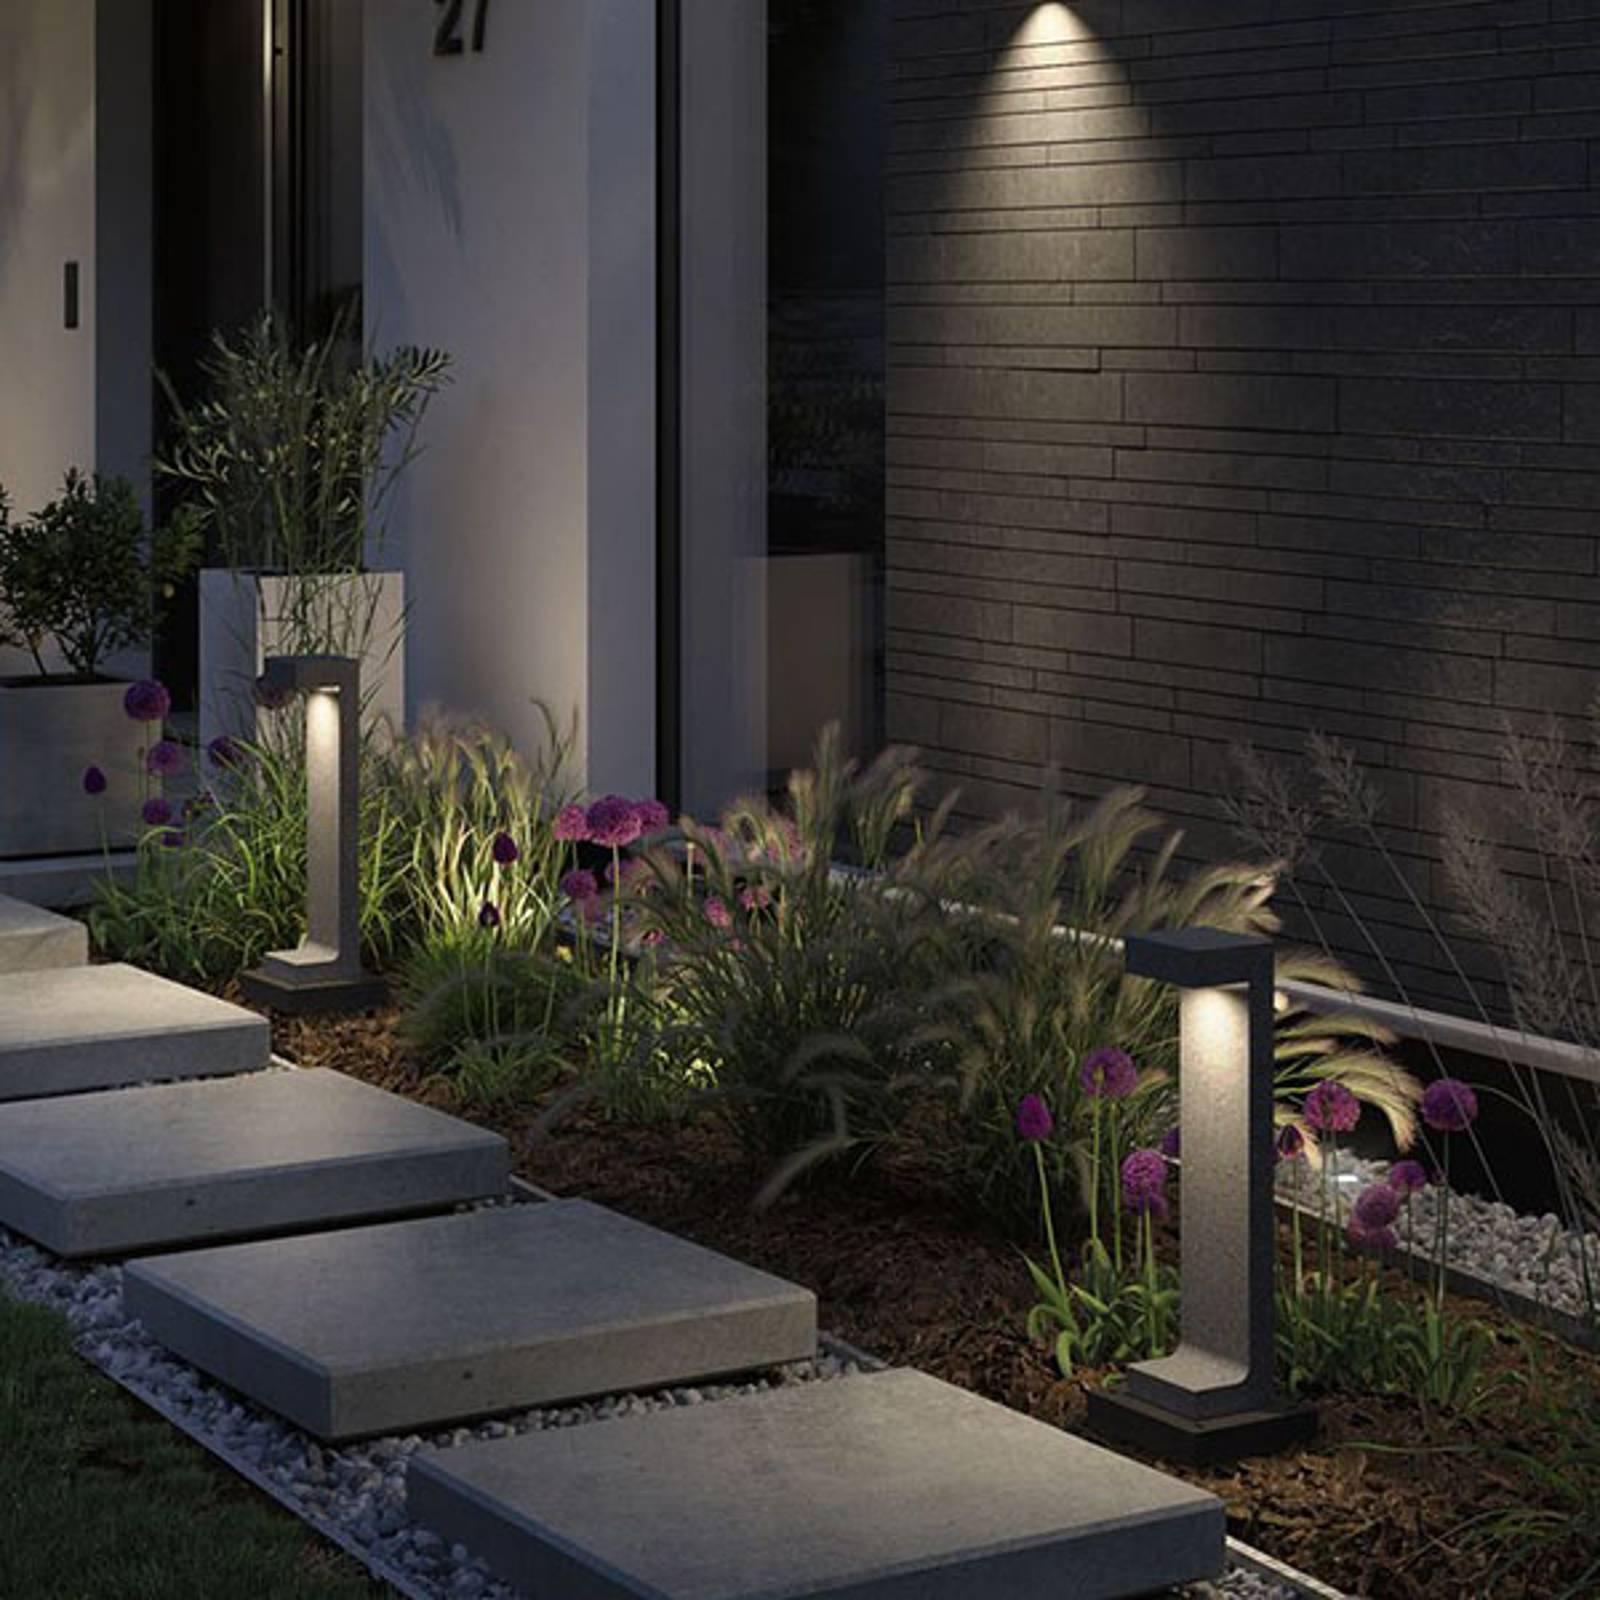 Paulmann Concrea LED-Wegeleuchte, Höhe 61 cm